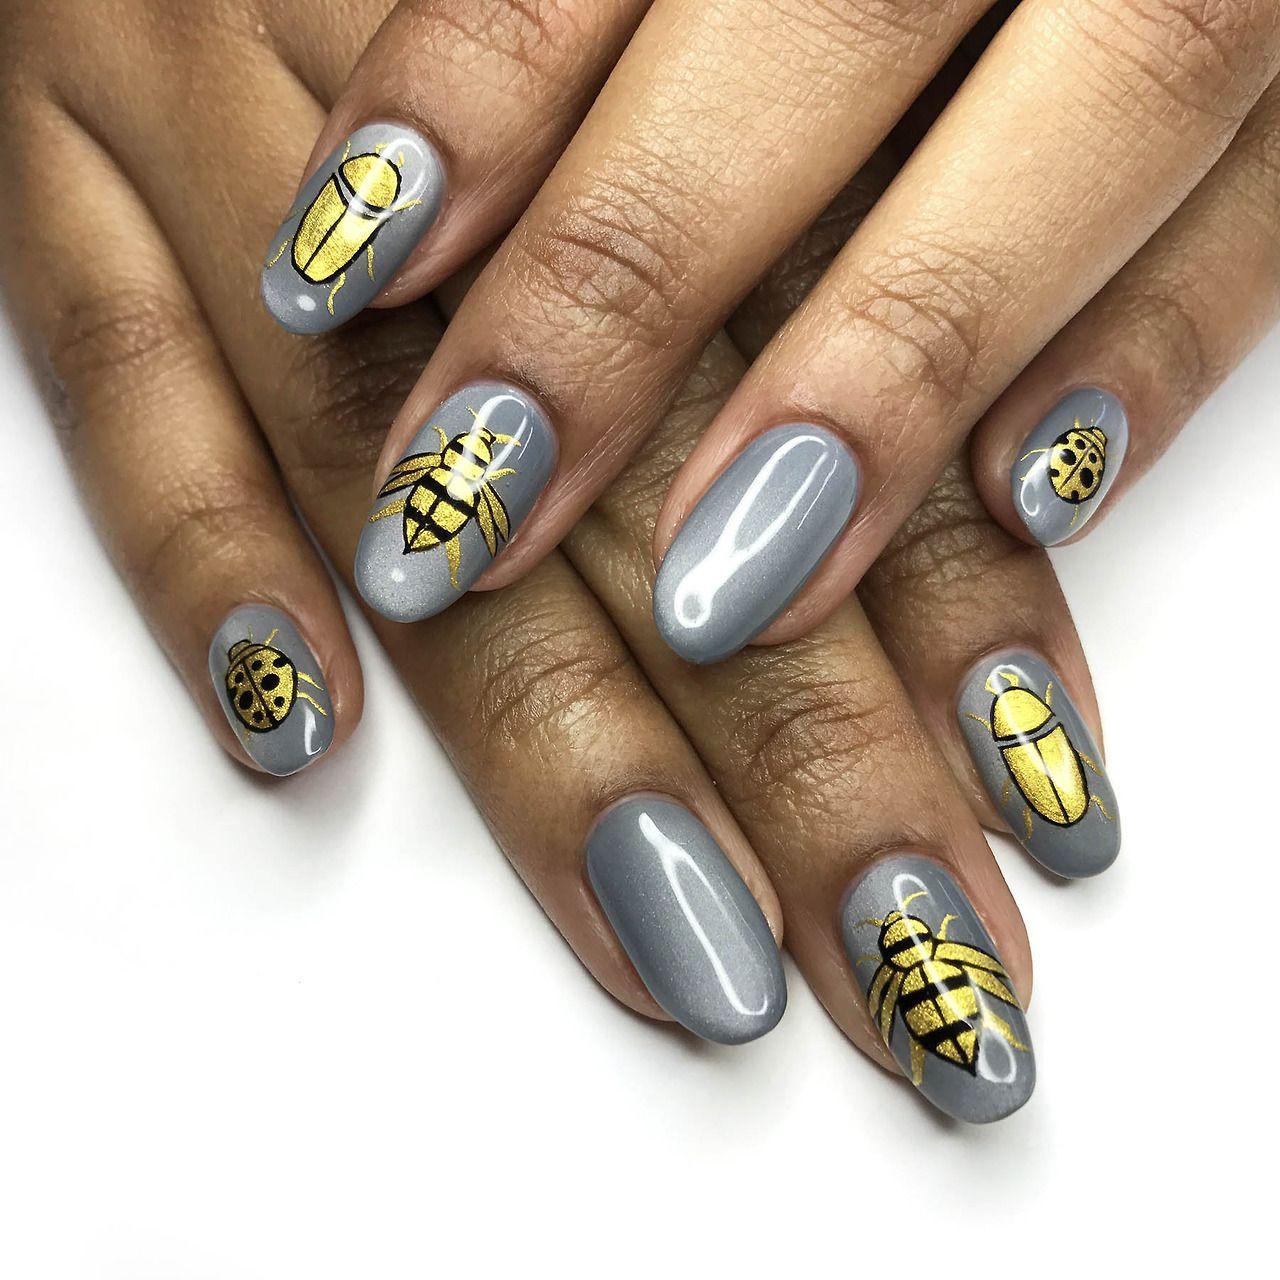 Unique Nail Art On Natural Nails Embellishment - Nail Polish Ideas ...